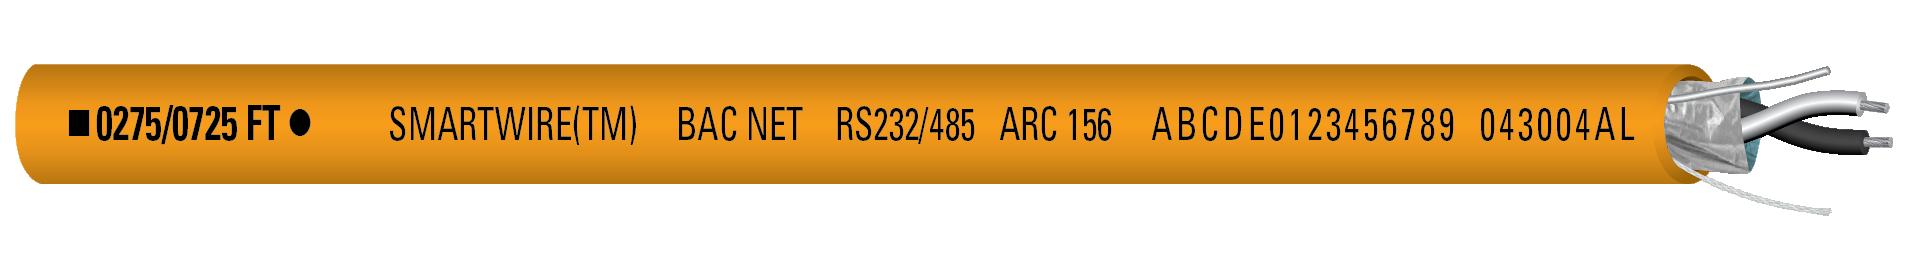 043004AL